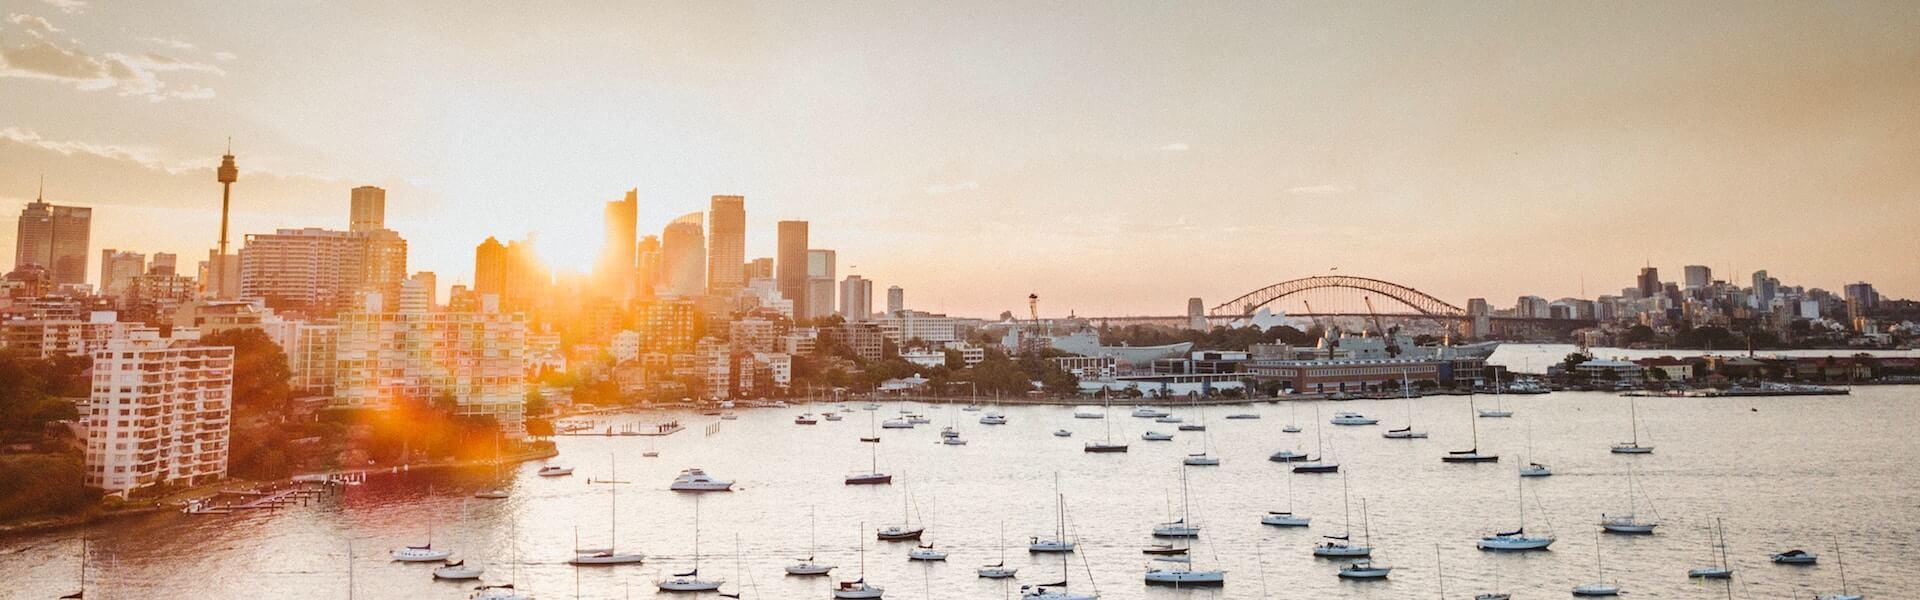 Flüge über Singapur nach Sydney - ariguru.de